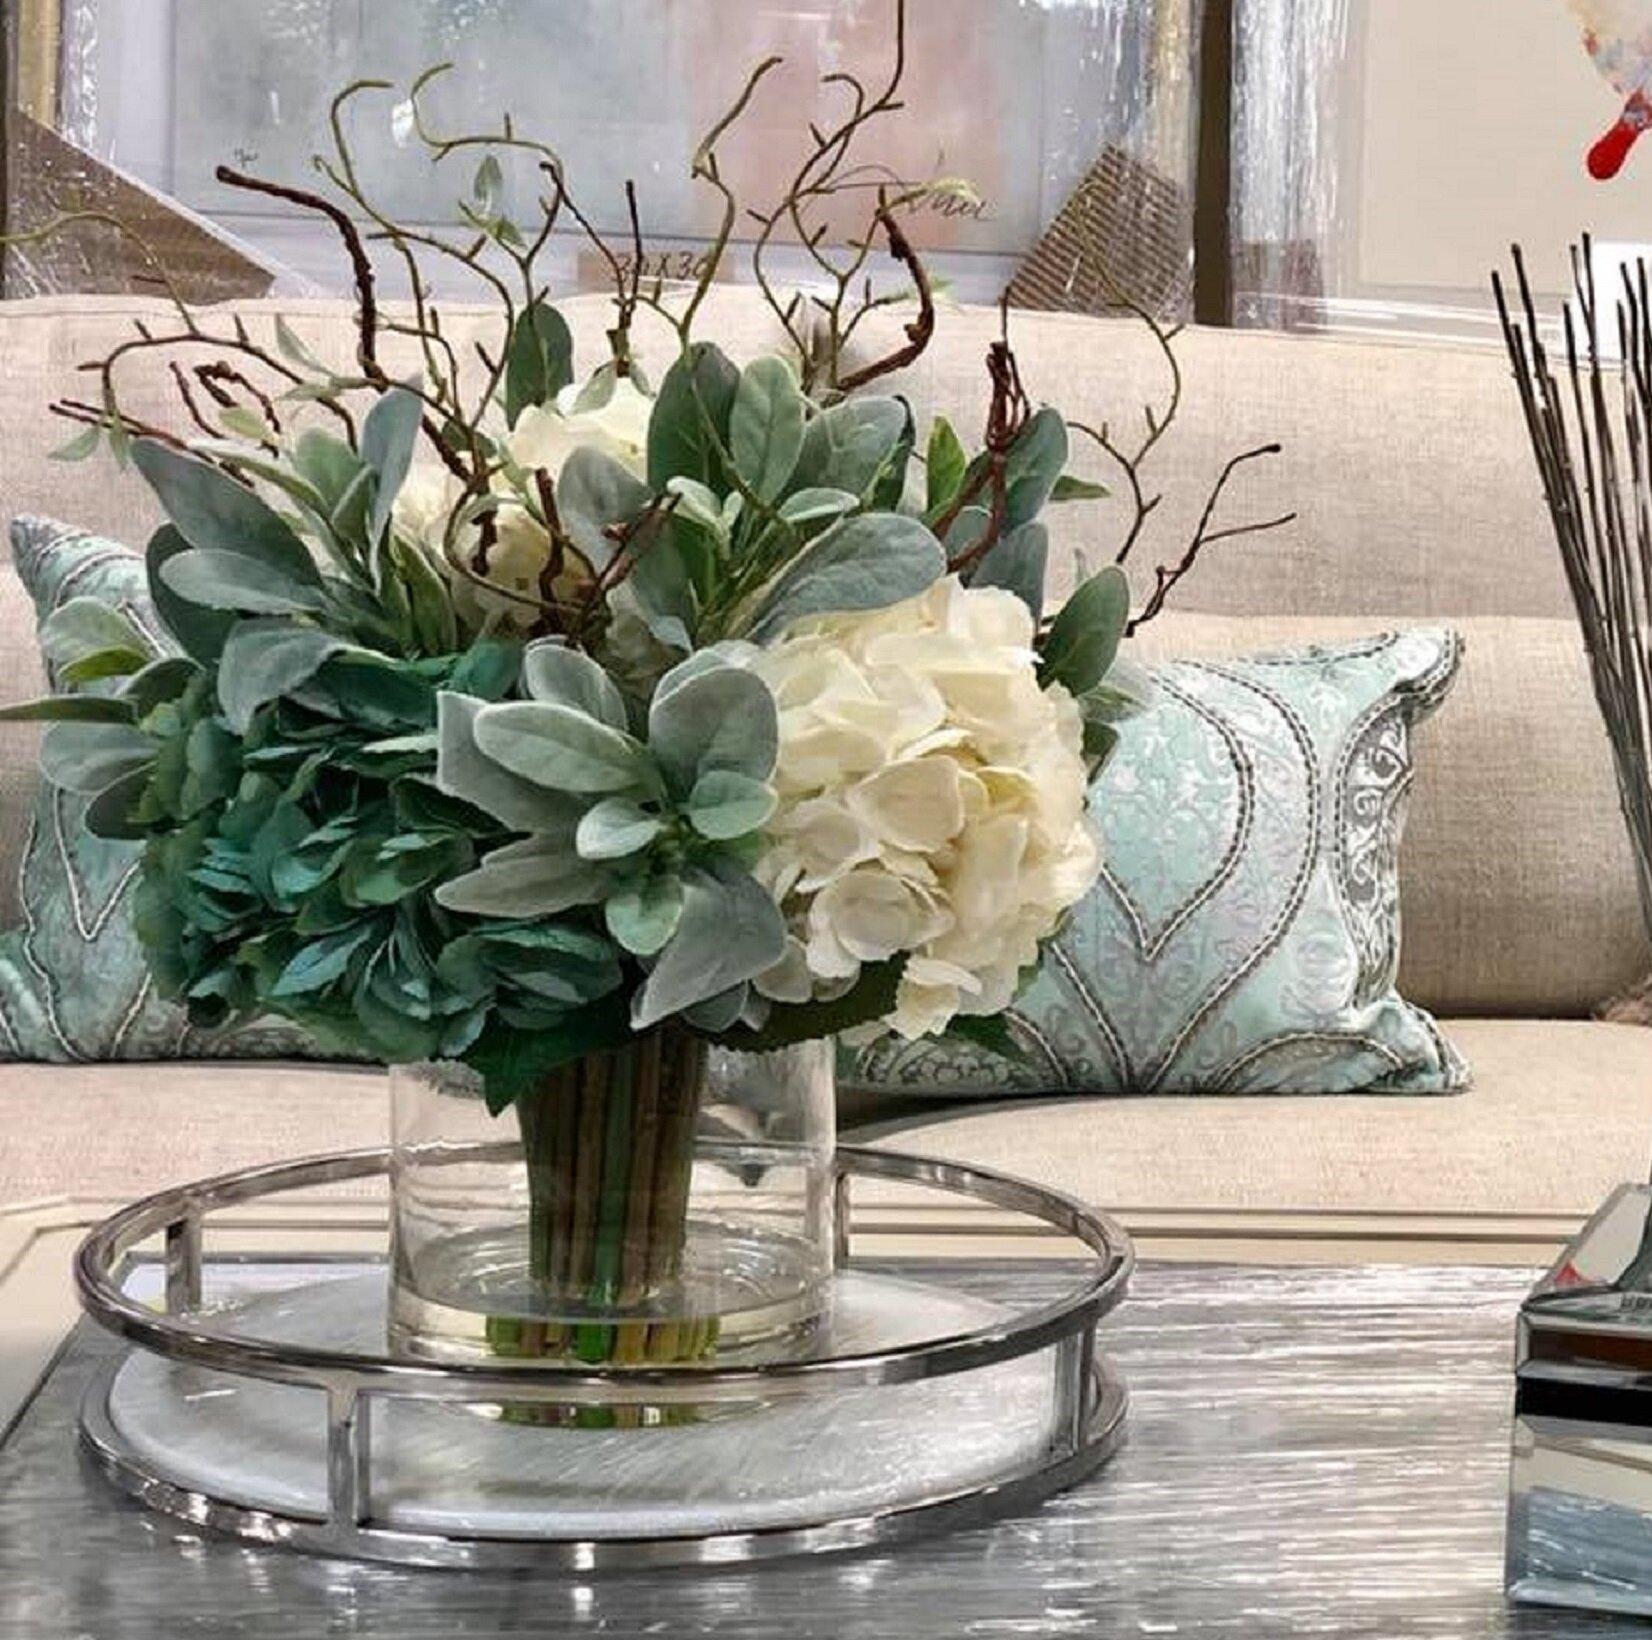 73cafe809448 August Grove Hydrangeas Floral Arrangement in Glass Vase   Reviews ...